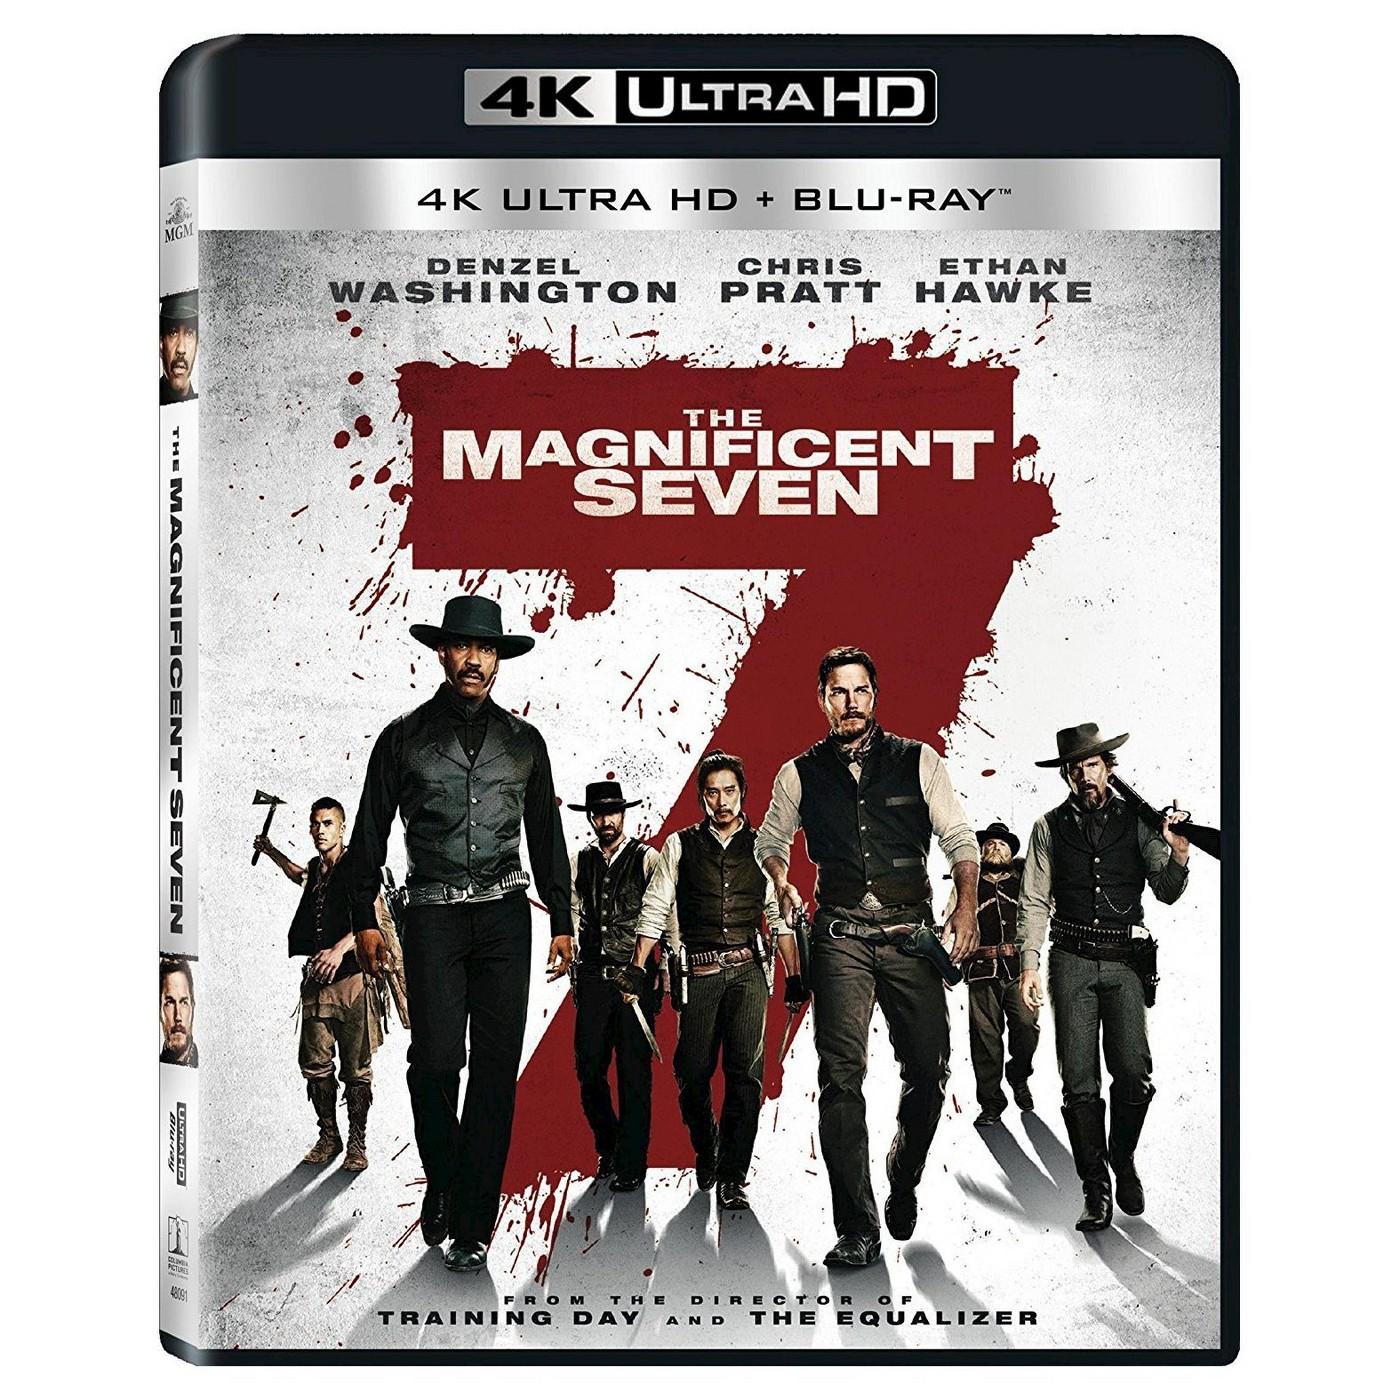 4k UHD Blu-Rays Under $10